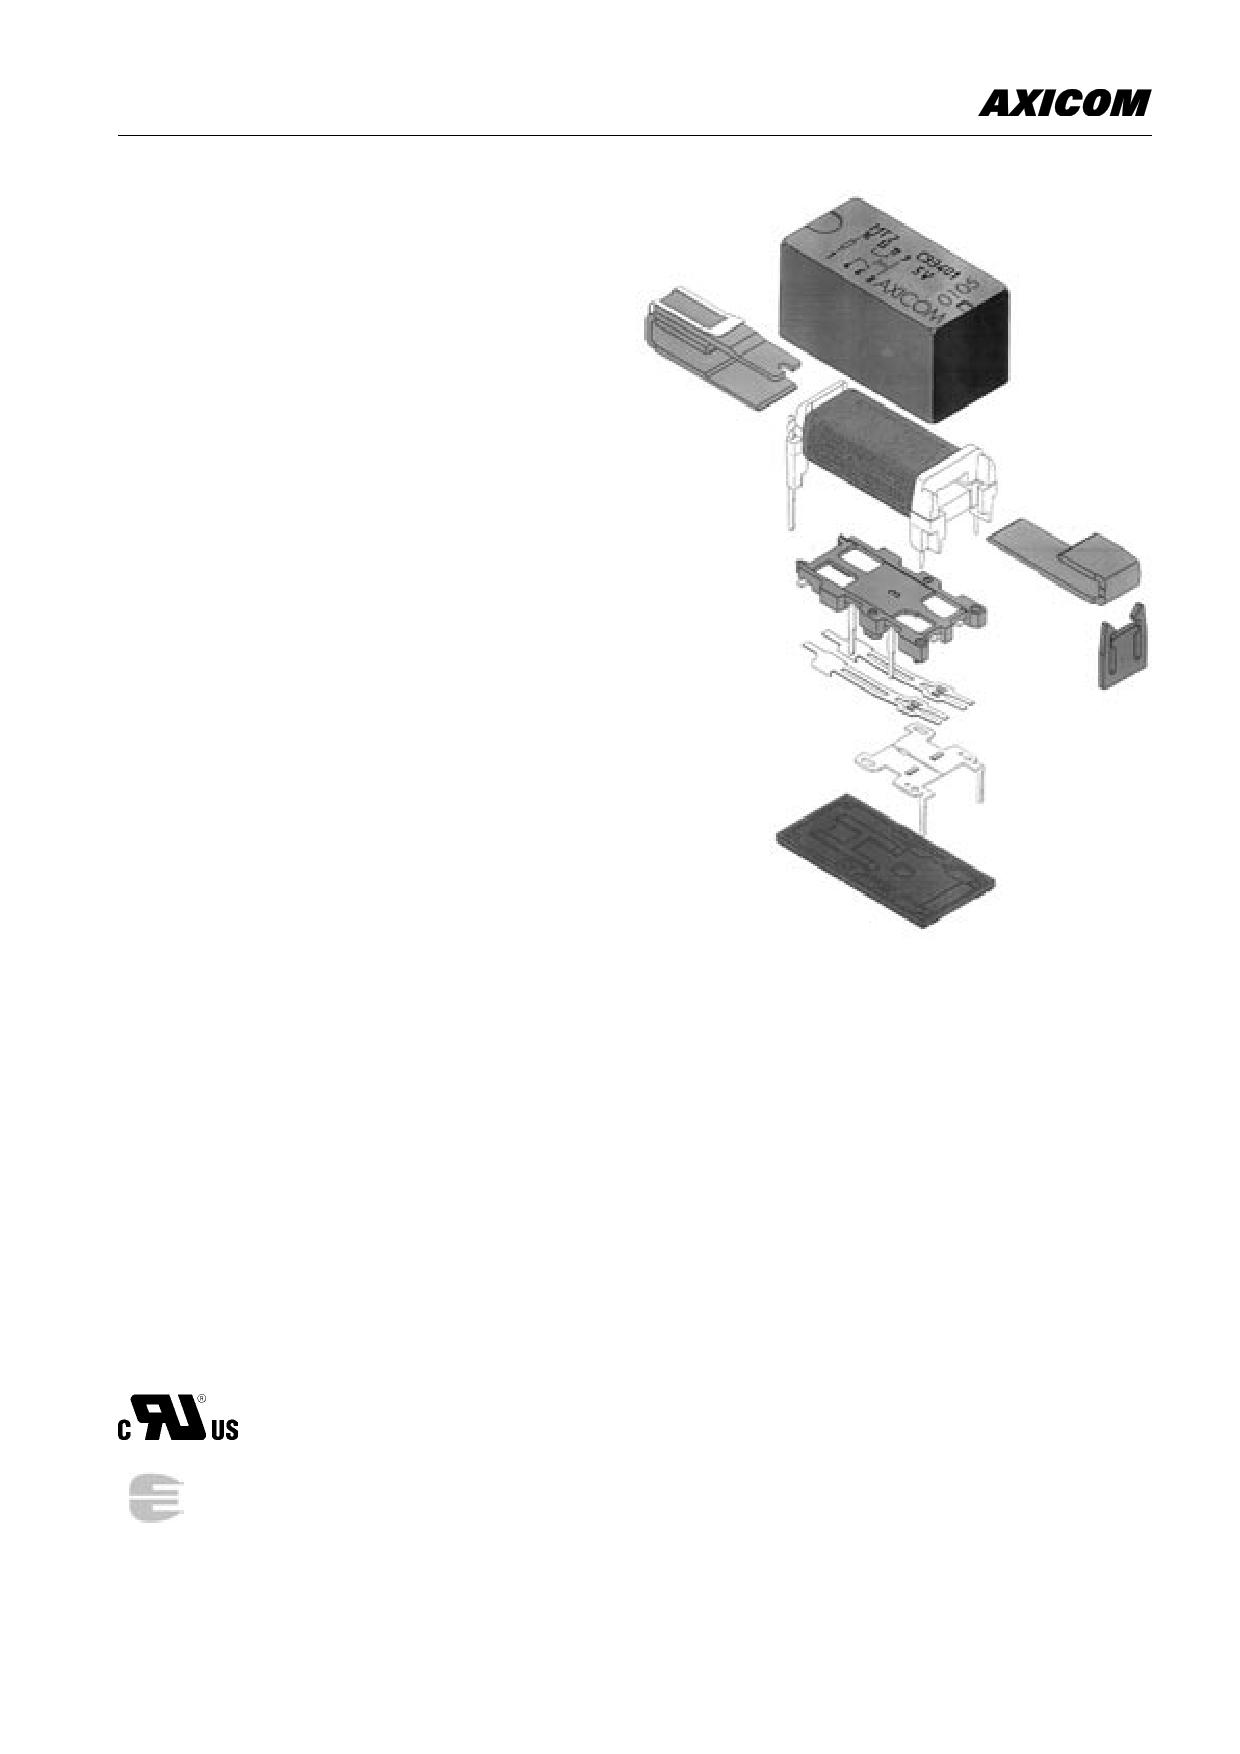 3-1462000-7 Даташит, Описание, Даташиты